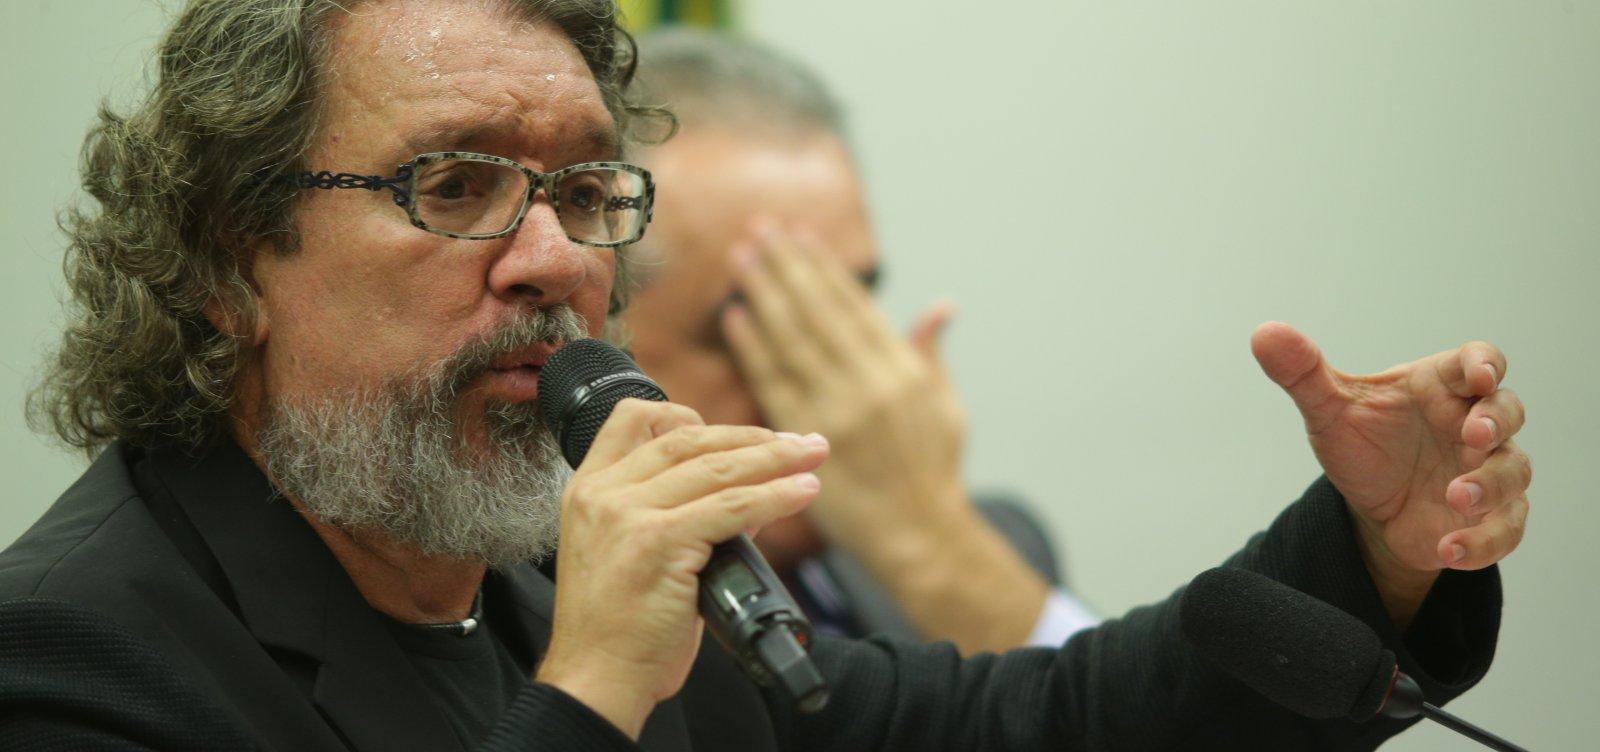 [Kakay diz que Aras será obrigado a denunciar Bolsonaro ou Moro]